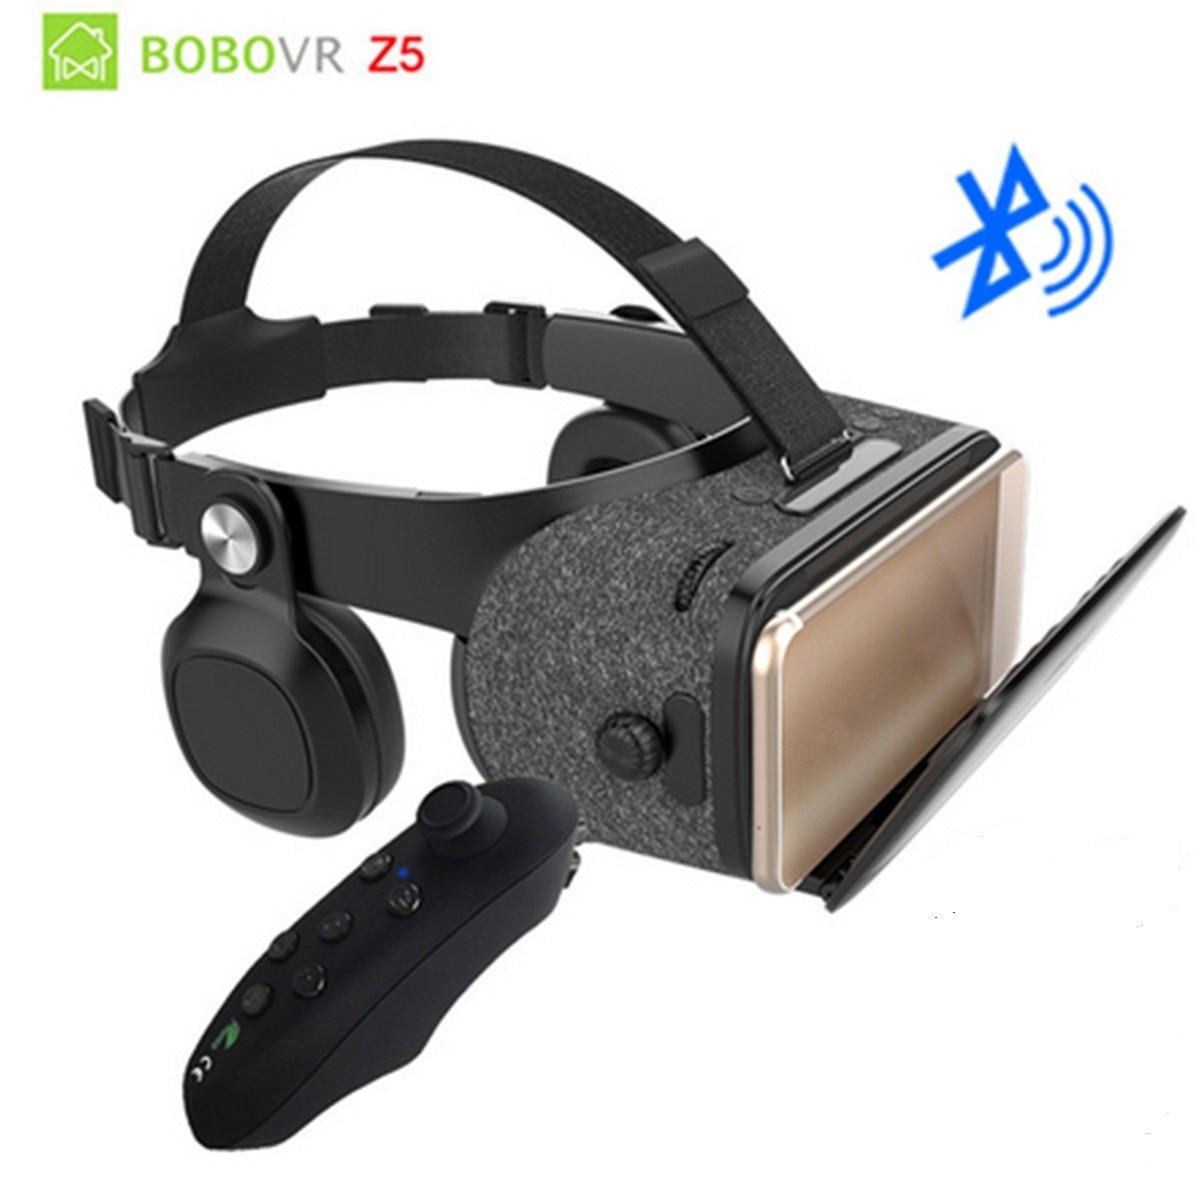 BOBOVR Z5 VR Virtual Reality Glasses Remote 3D Android Cardboard for Smartphones 4.7-6.2 VR 3D Headset Stereo Helmet Box bobovr z5 daydream stereo 3d glasses vr cardboard helmet virtual reality phone headset box for 4 7 6 2 gyro vr controller